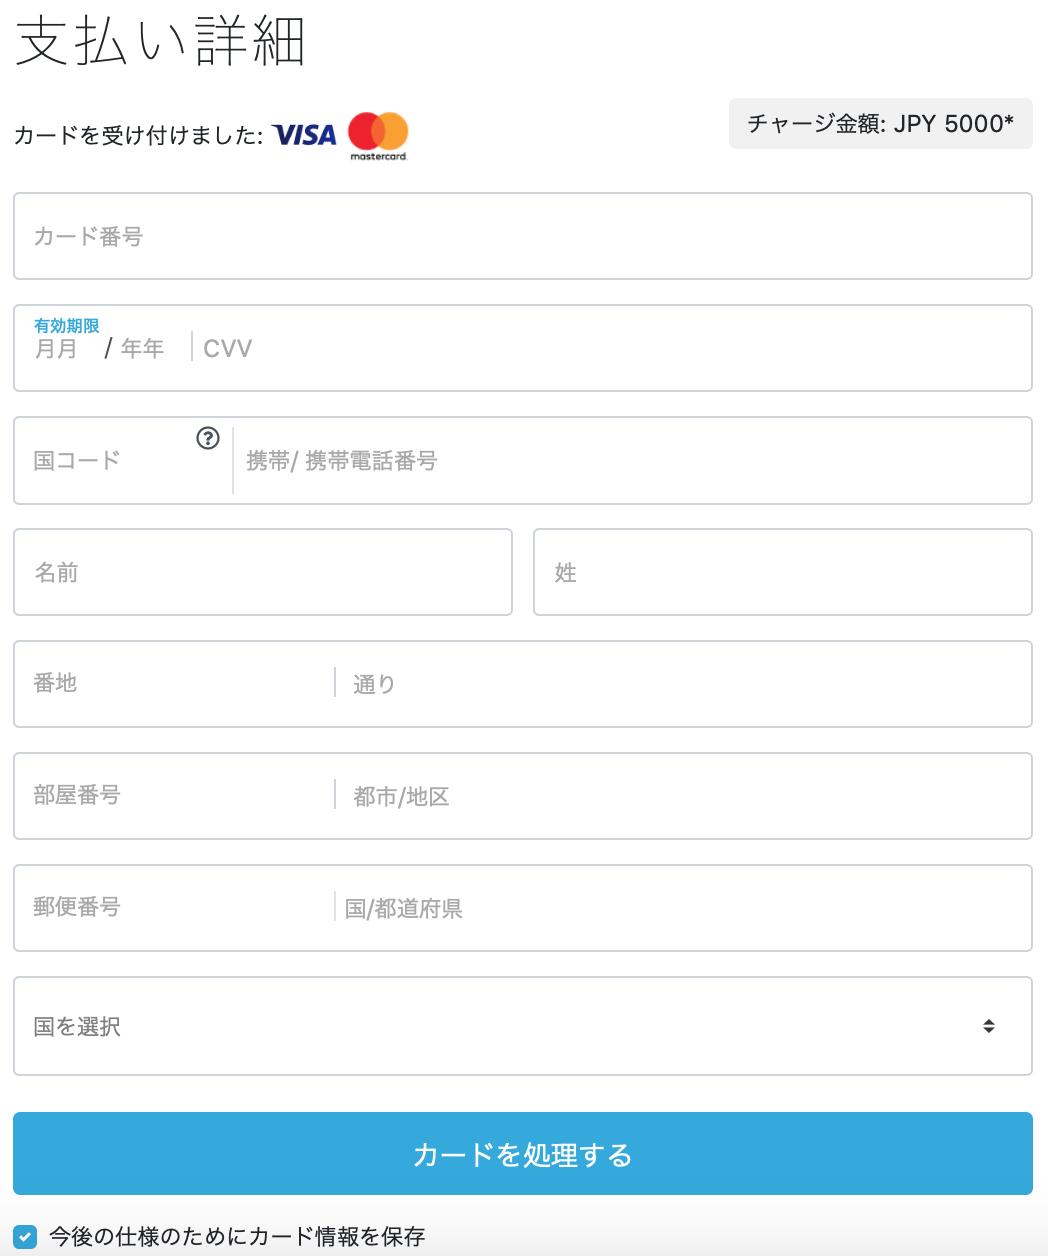 sportsbetio入金方法・クレジットカードビットコイン購入方法4